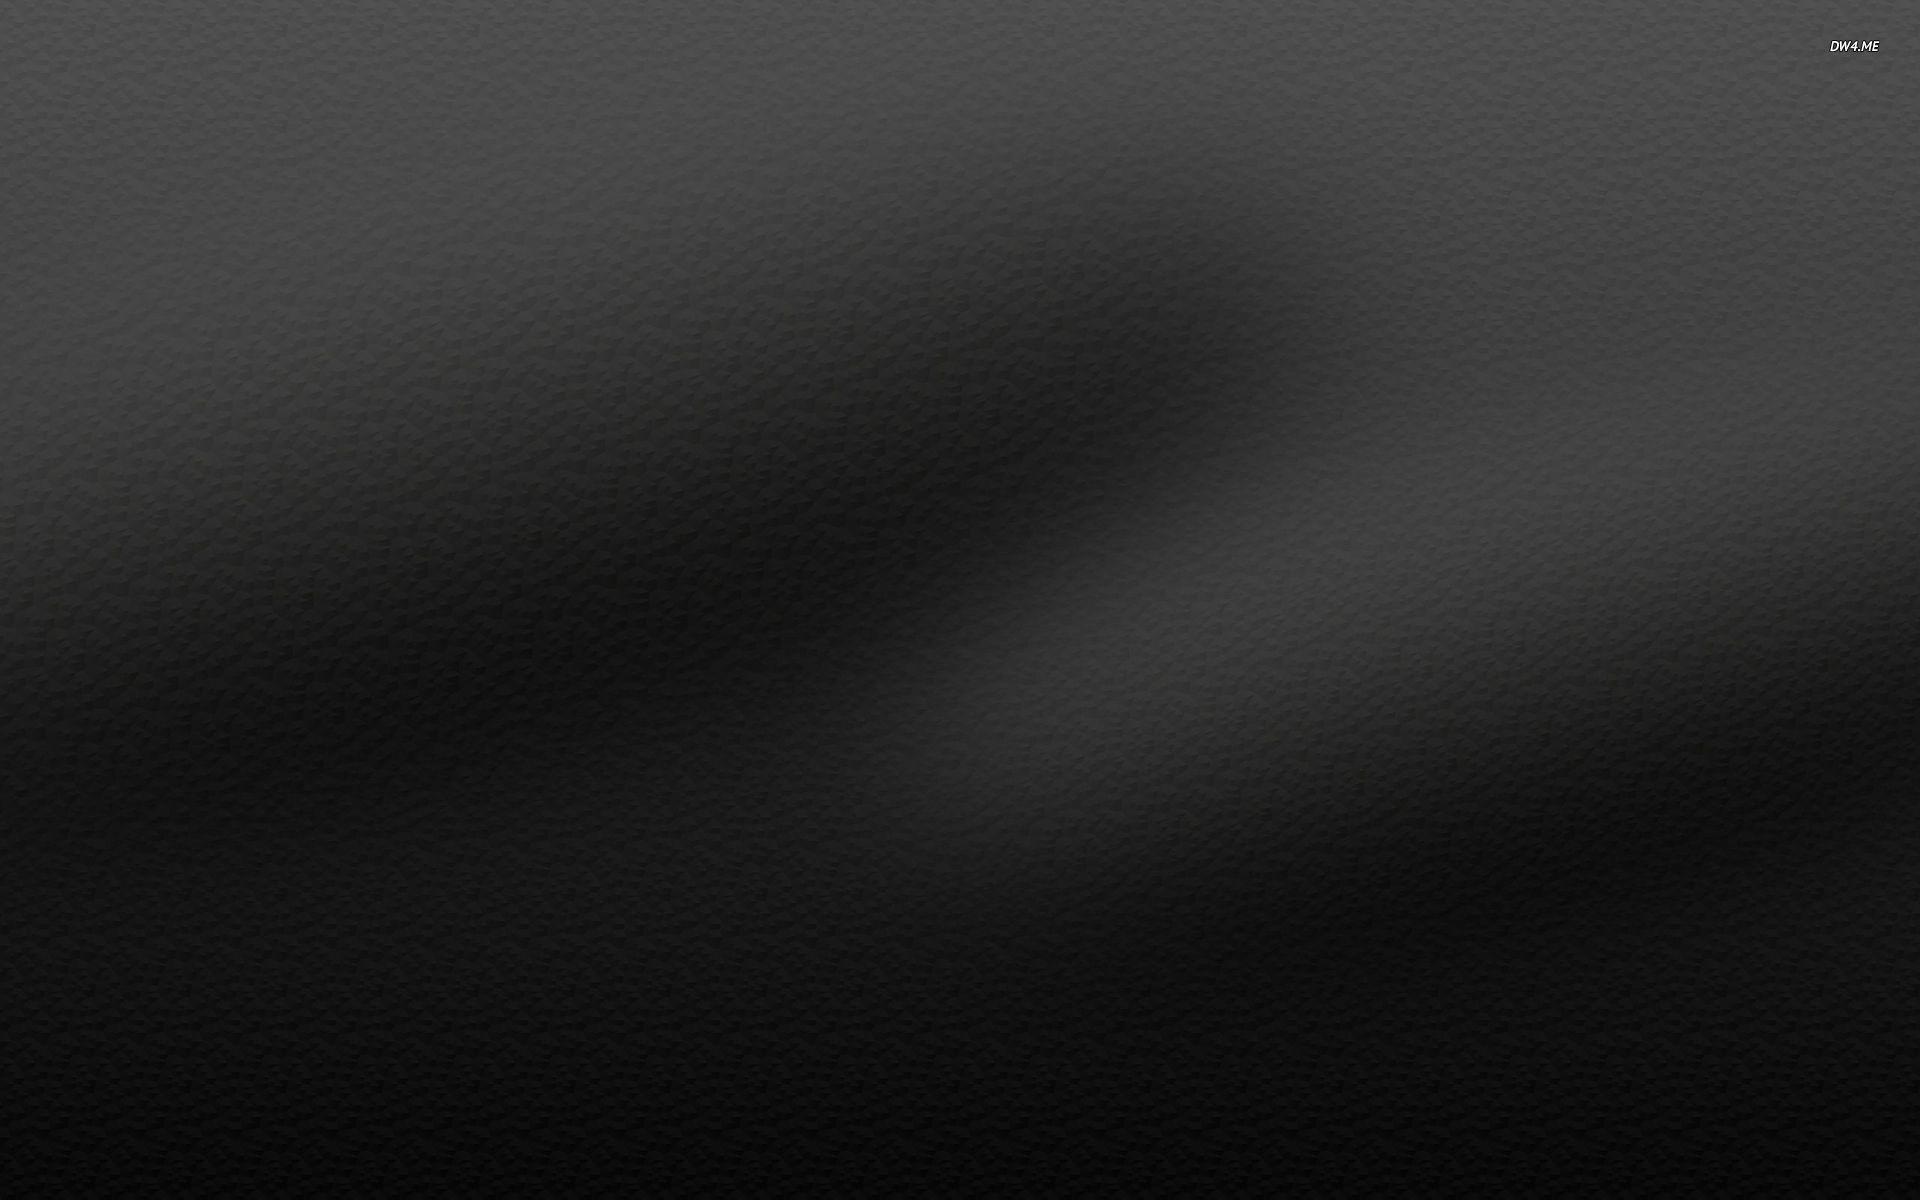 shiny black wallpaper wallpapersafari. Black Bedroom Furniture Sets. Home Design Ideas